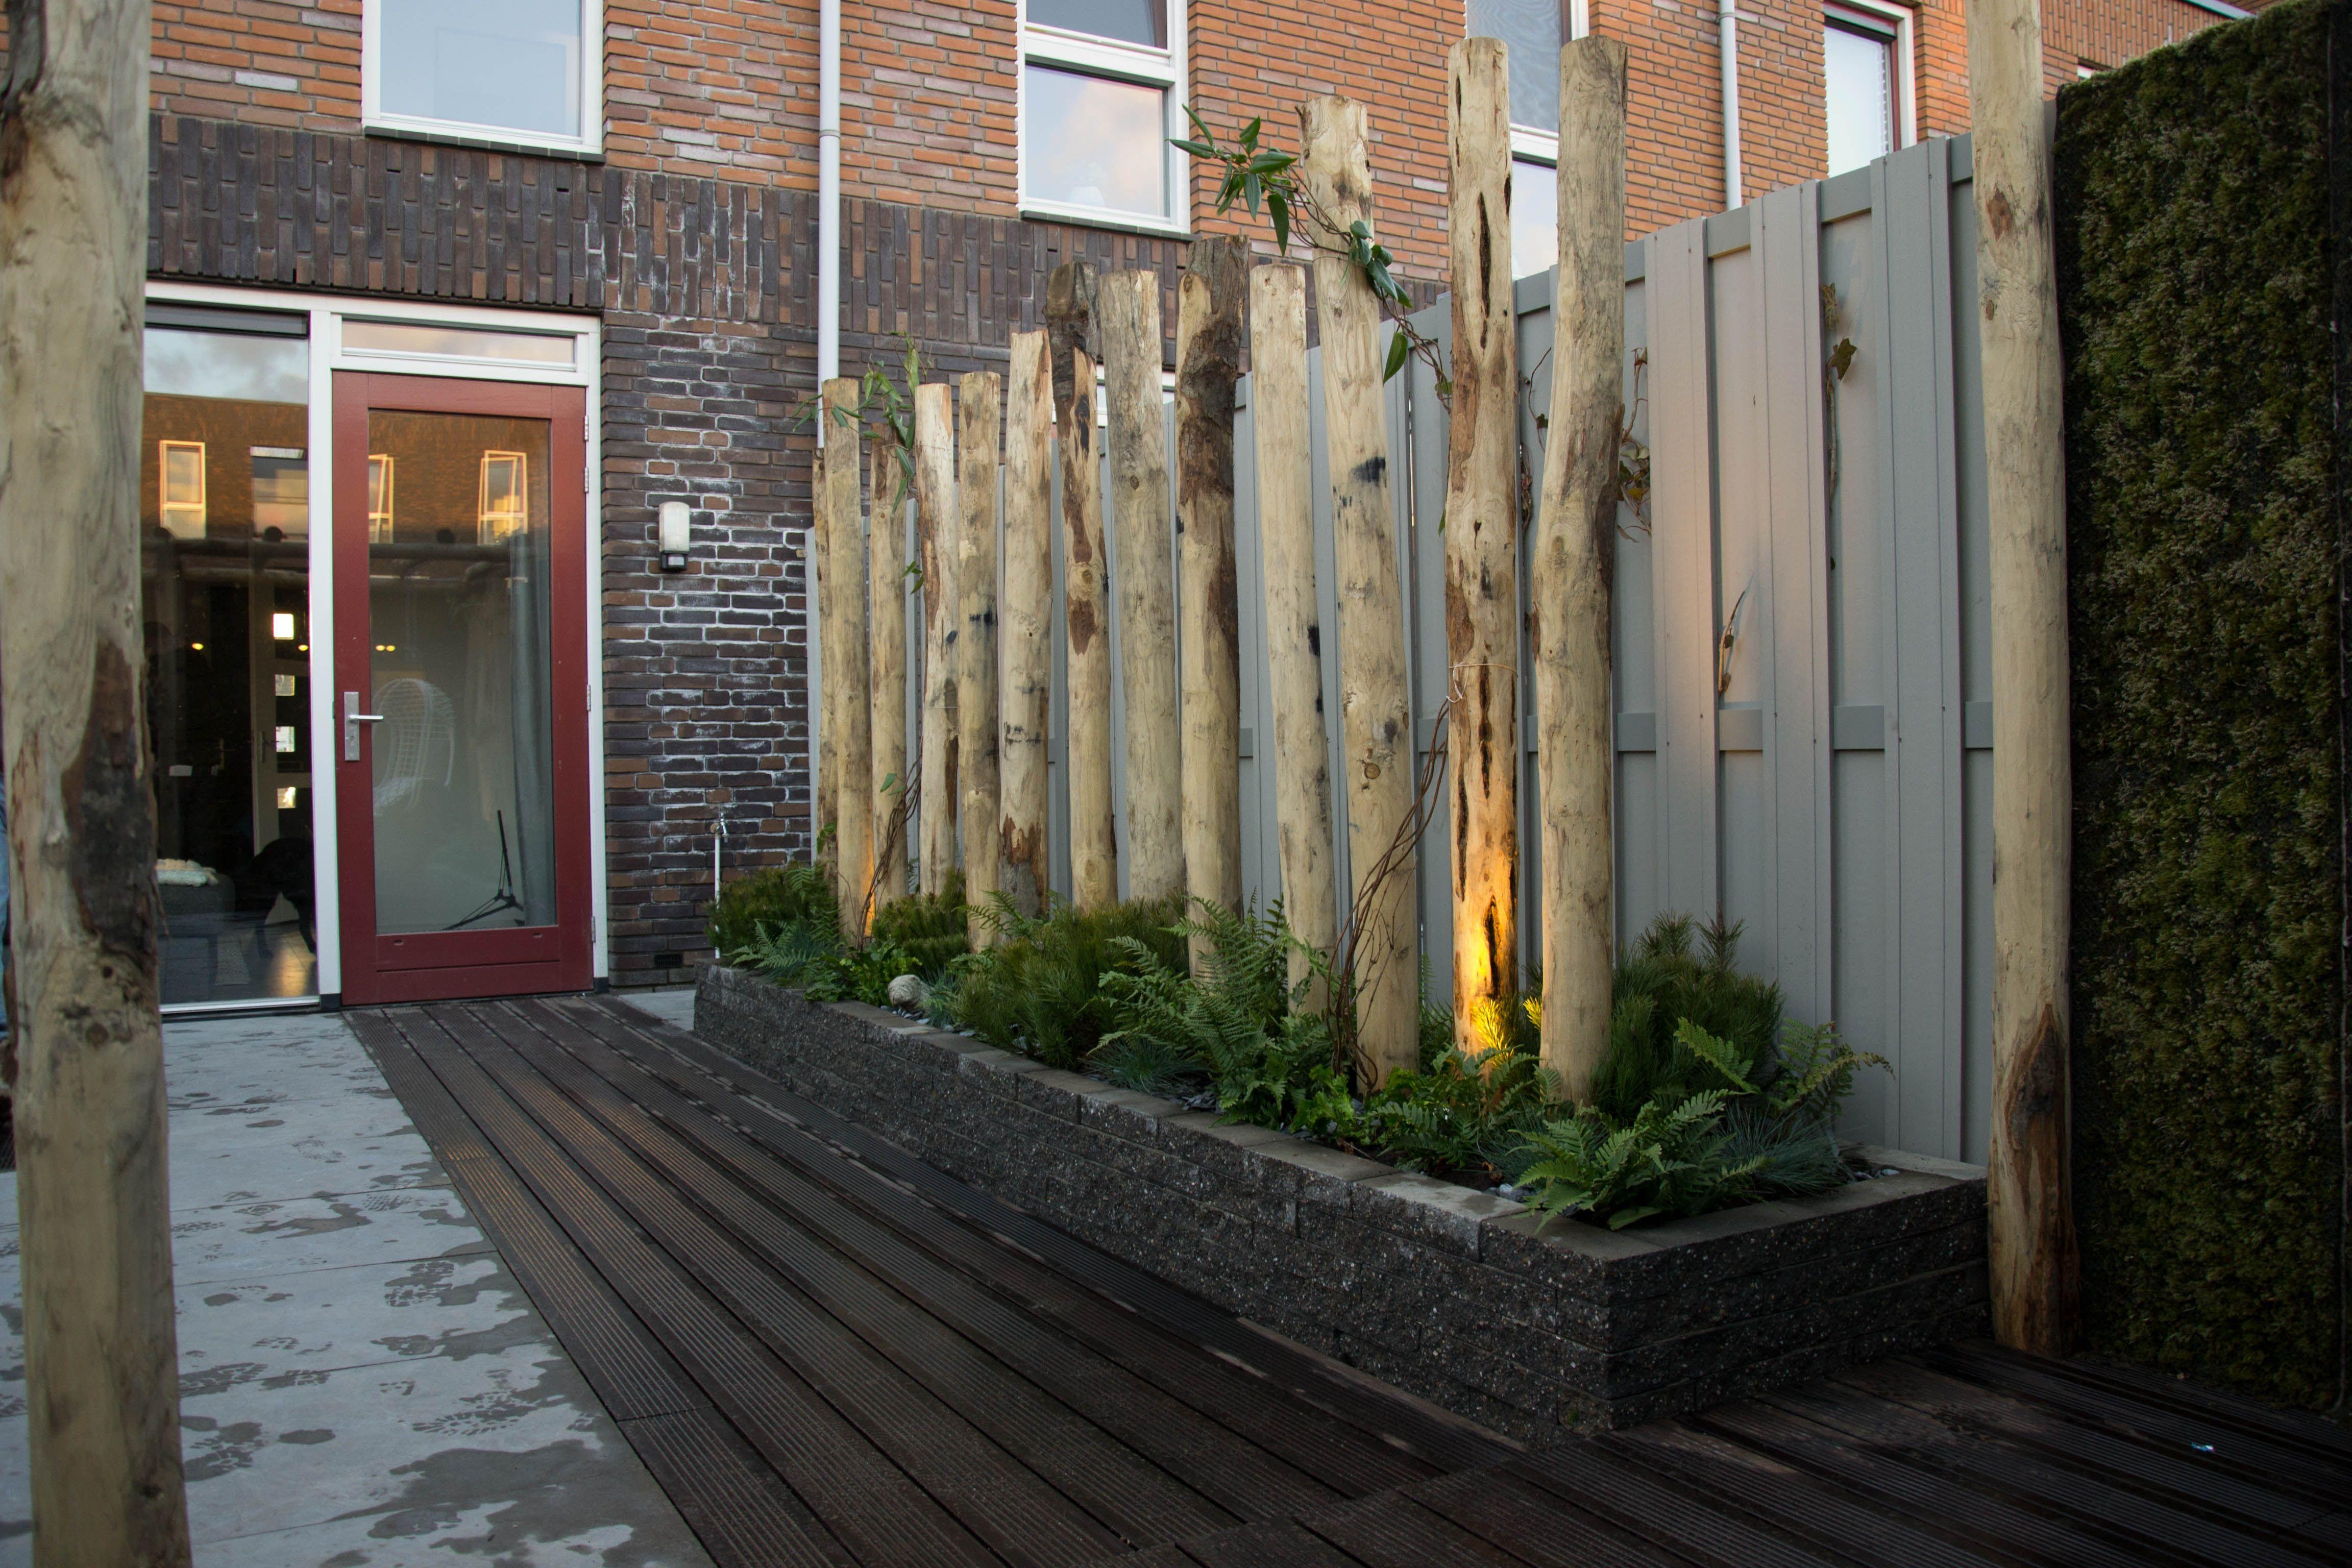 Eigen huis en tuin praxis maak je tuin uniek met takken for Tuin praxis